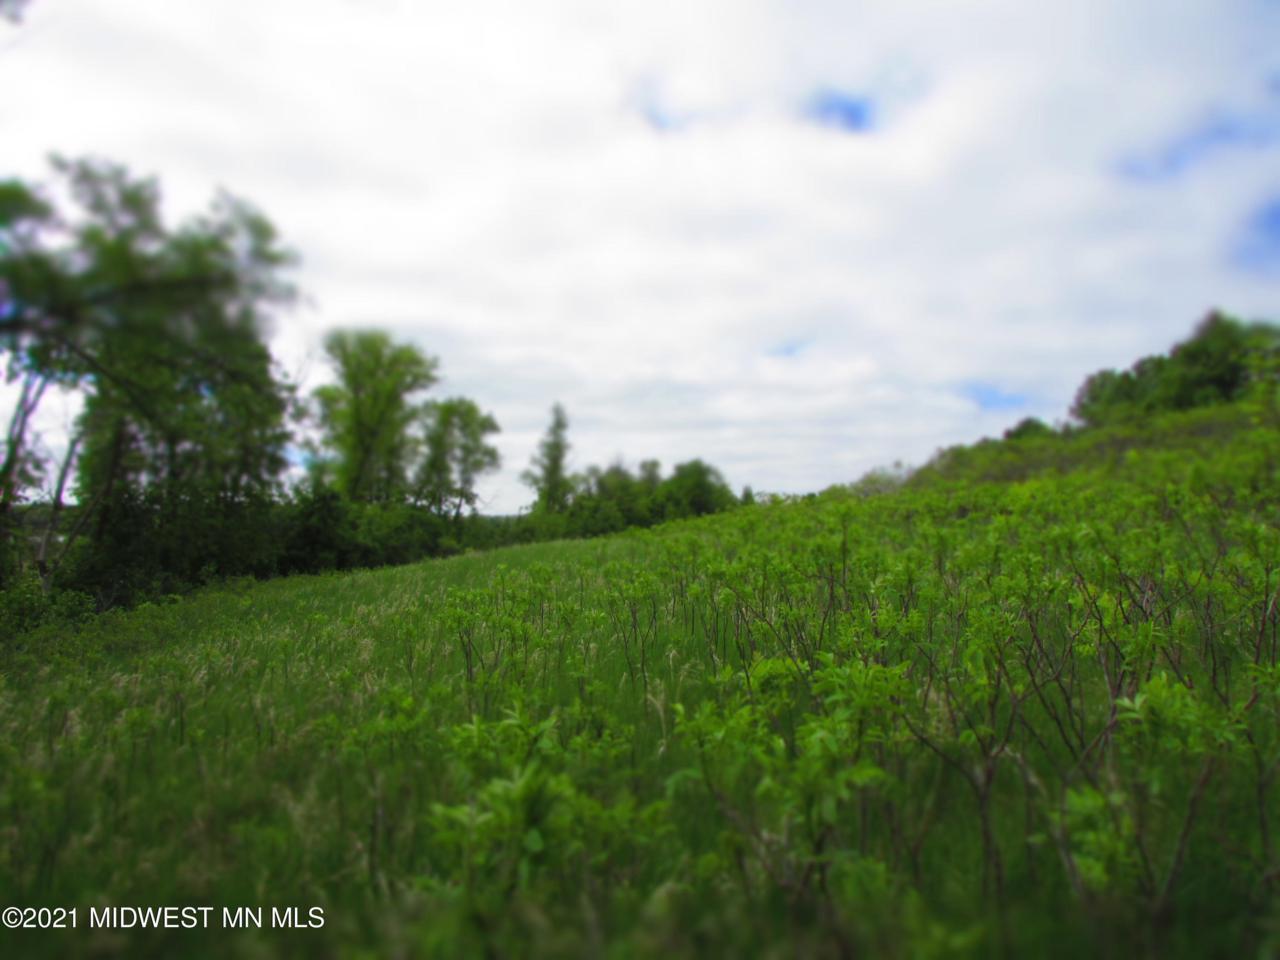 https://bt-photos.global.ssl.fastly.net/lakescountry/1280_boomver_1_20-33801-2.jpg